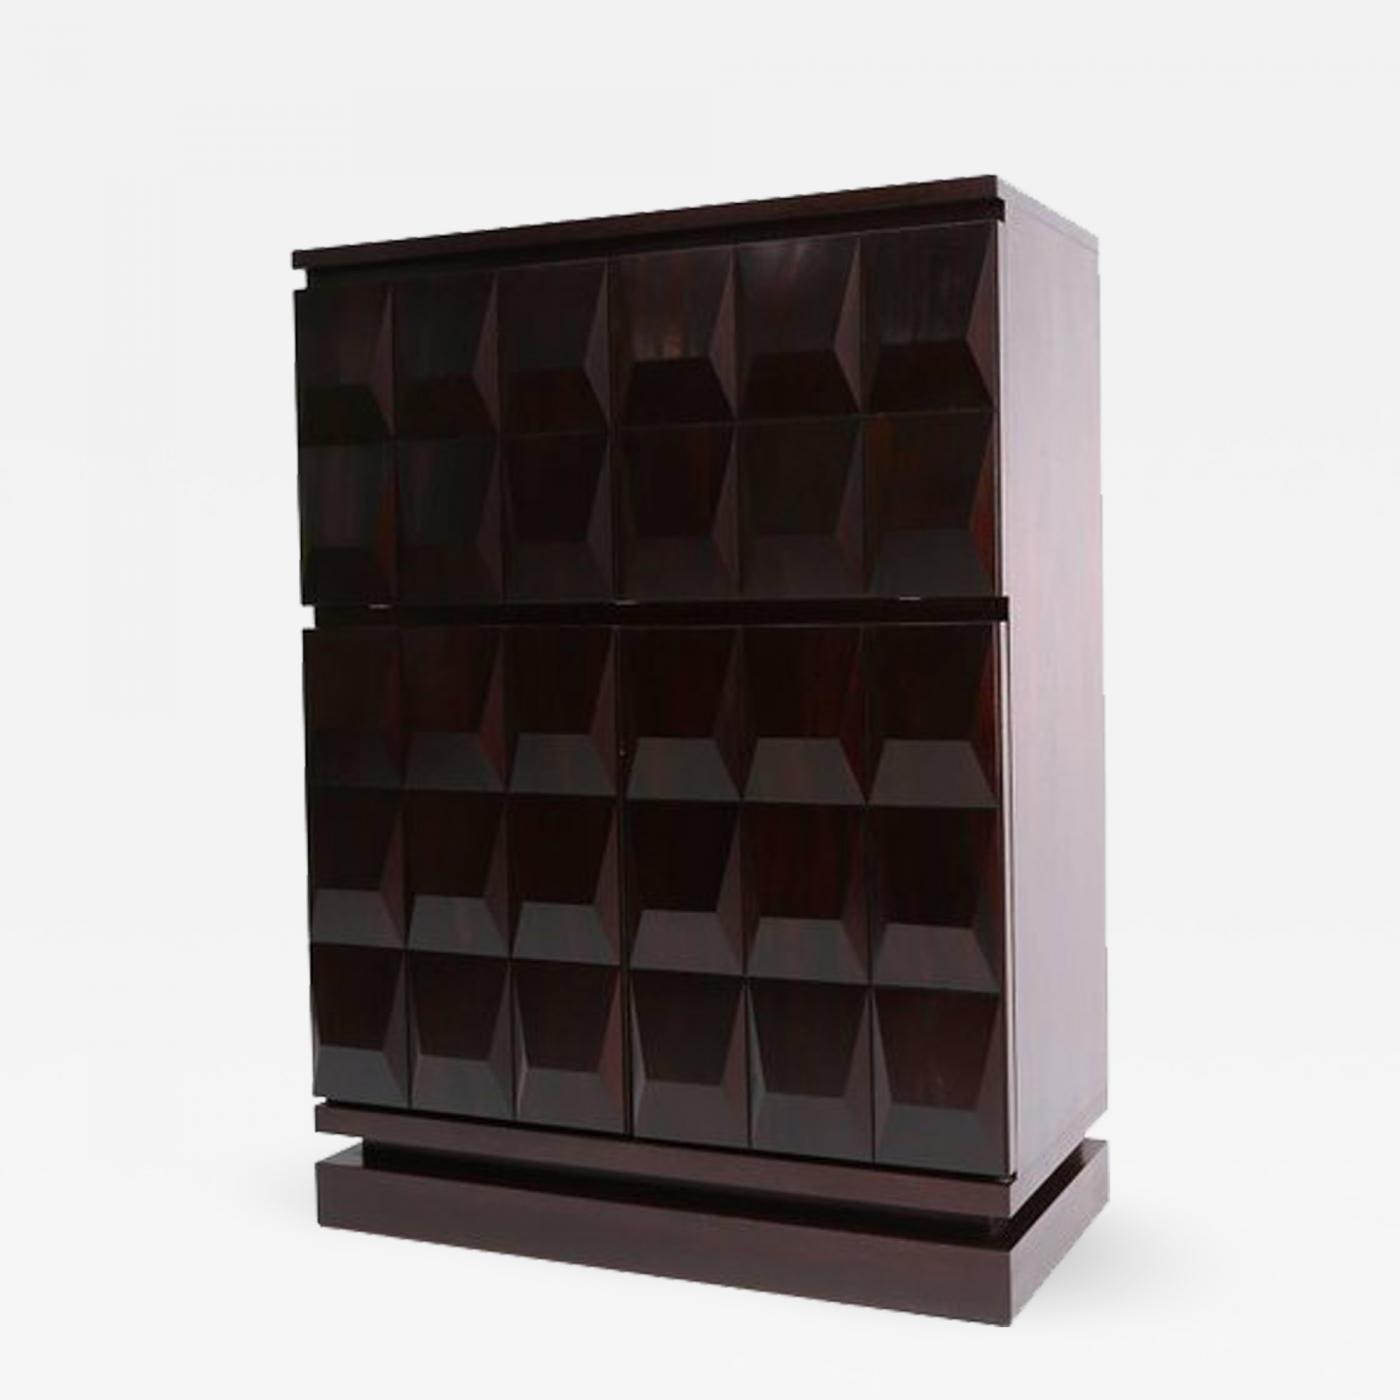 Listings / Furniture / Case Pieces U0026 Storage / Cabinets · De Coene  Brutalist Diamond Bar ...